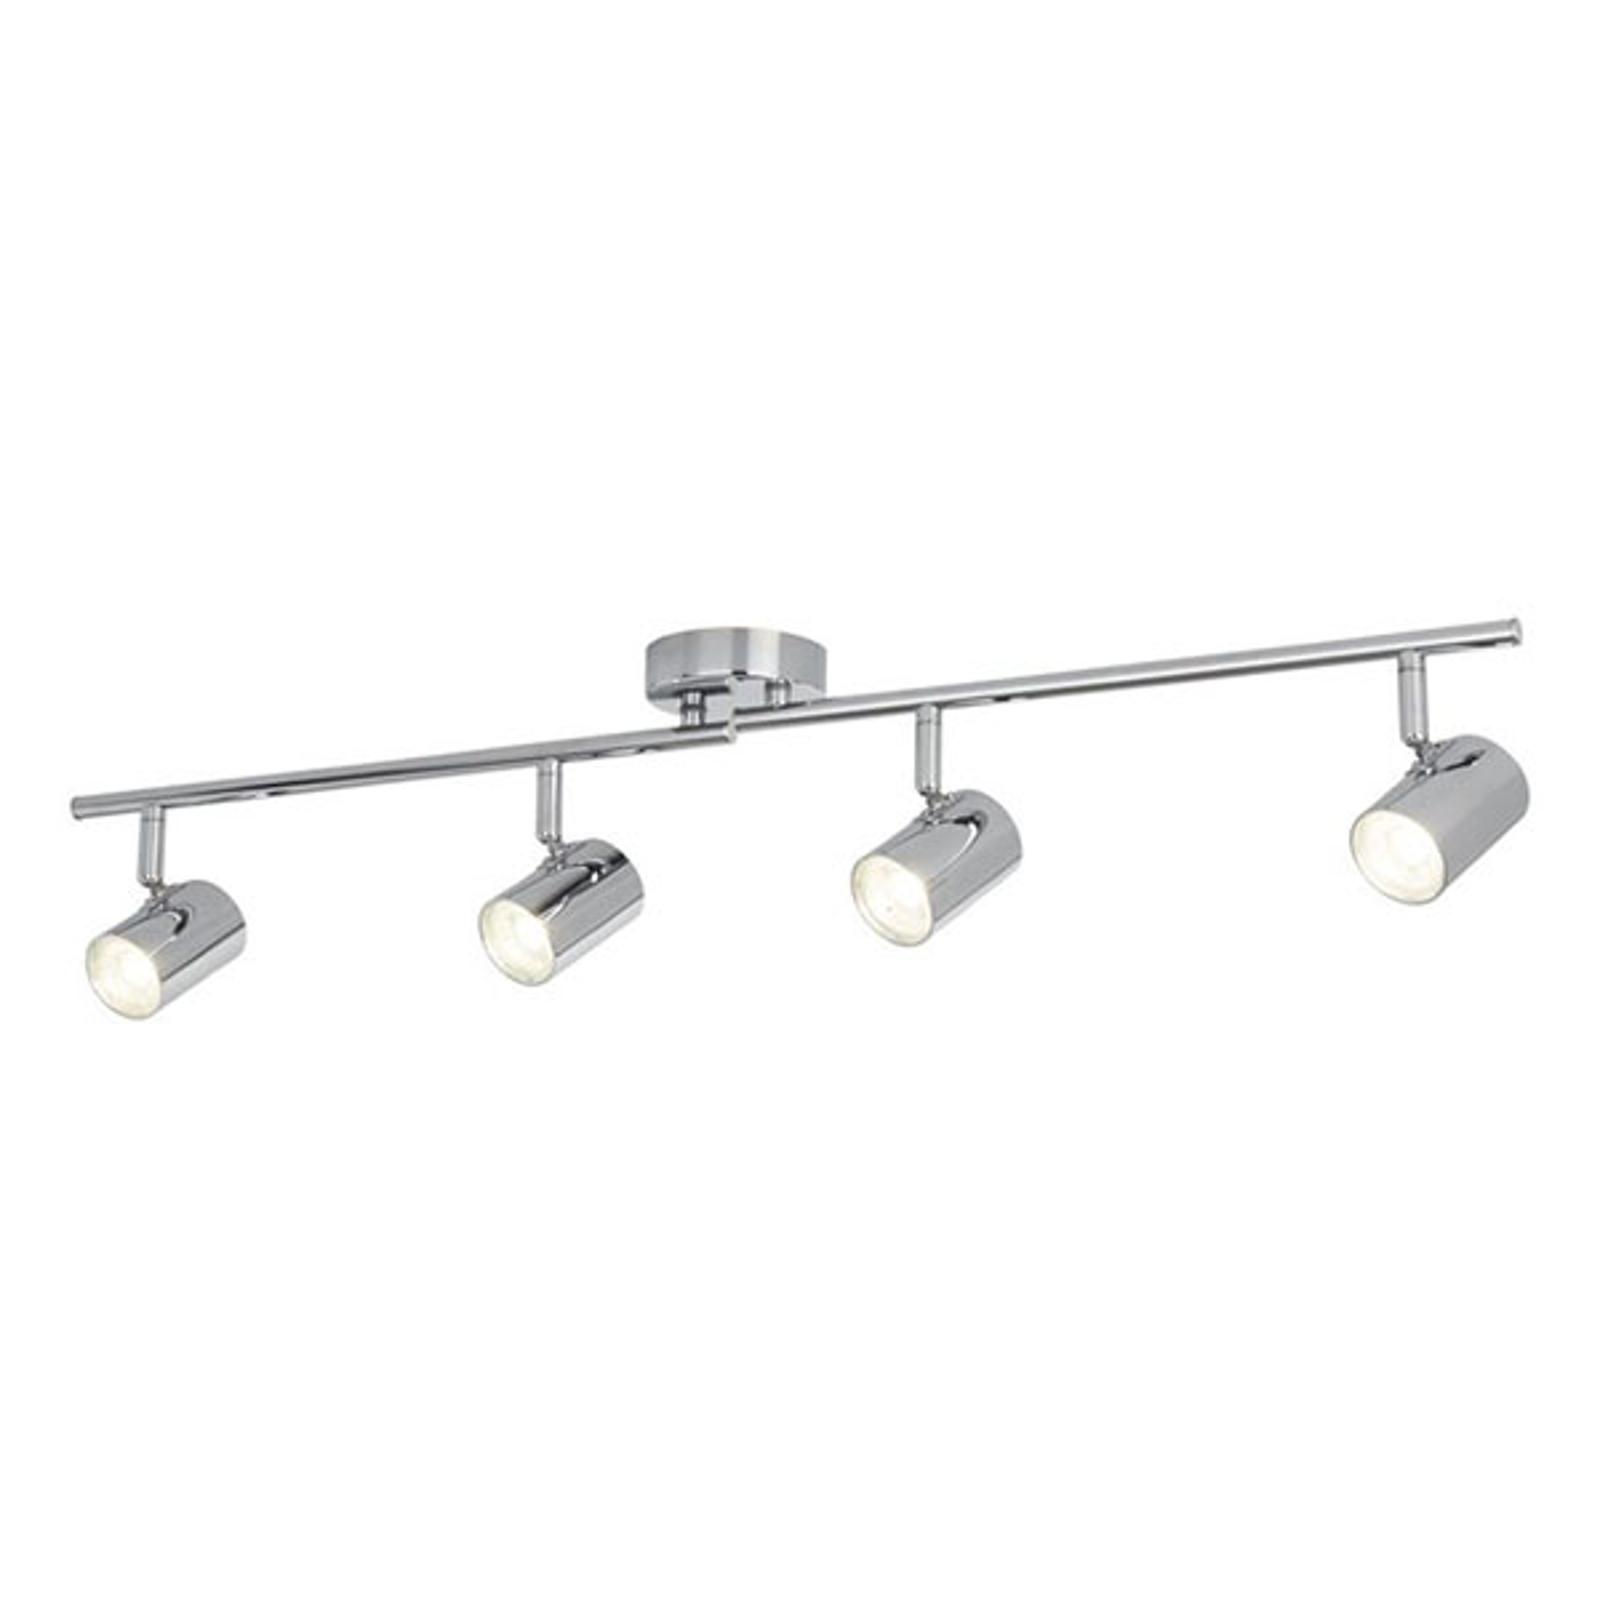 LED-Deckenstrahler Rollo, vierflammig, chrom